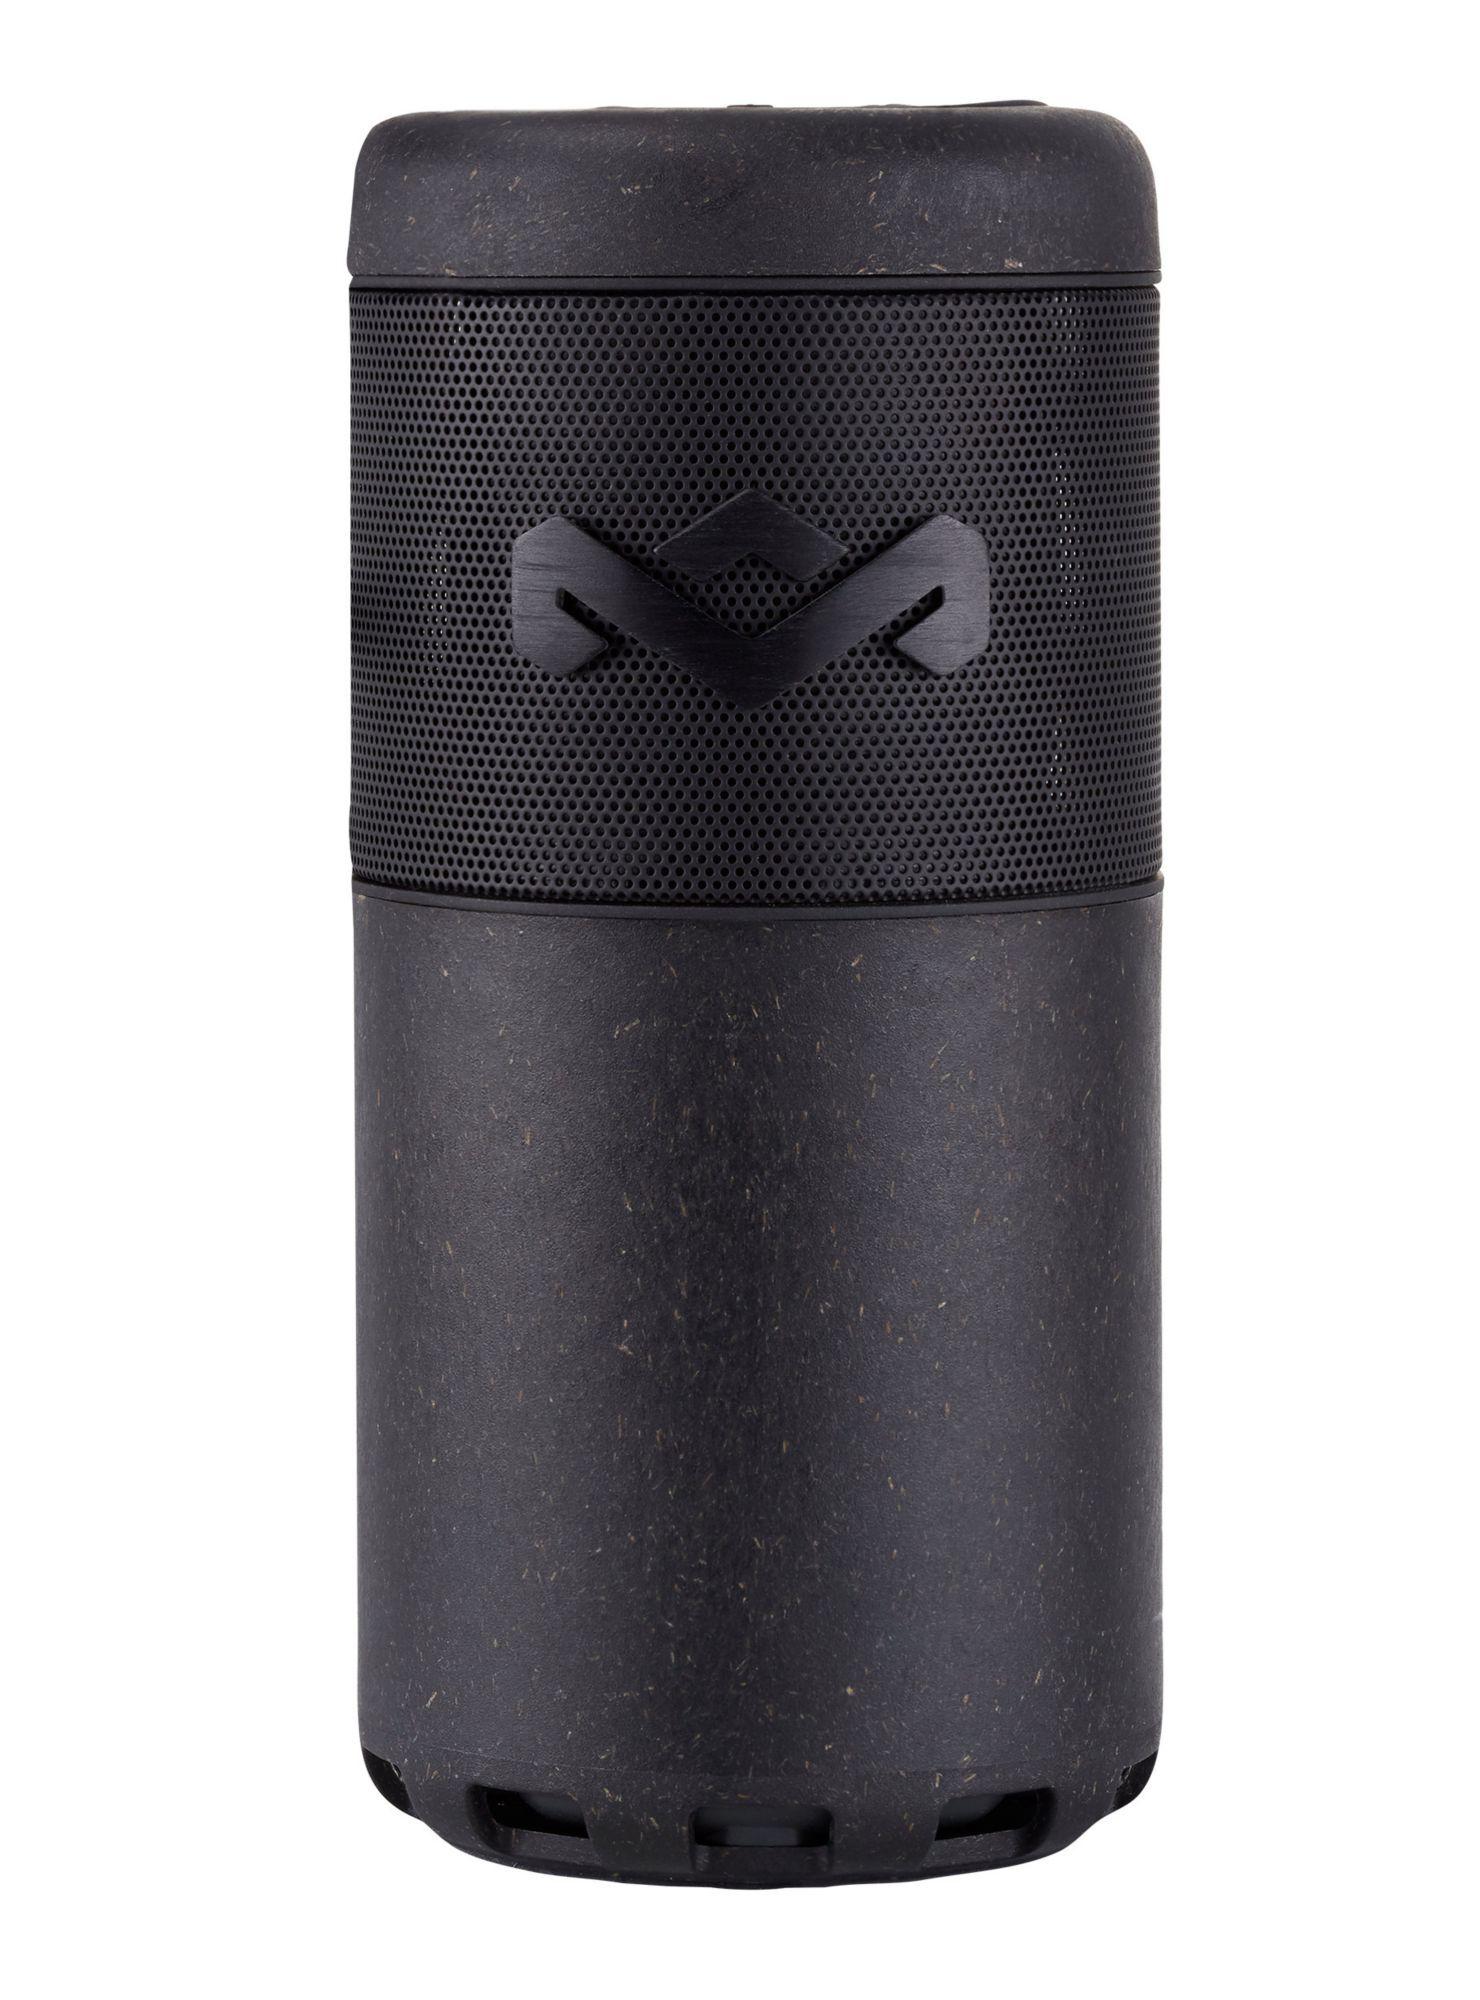 Parlante Portatil Marley Chant Sport Black Bluetooth - Parlantes ... 8b61eb70f72a